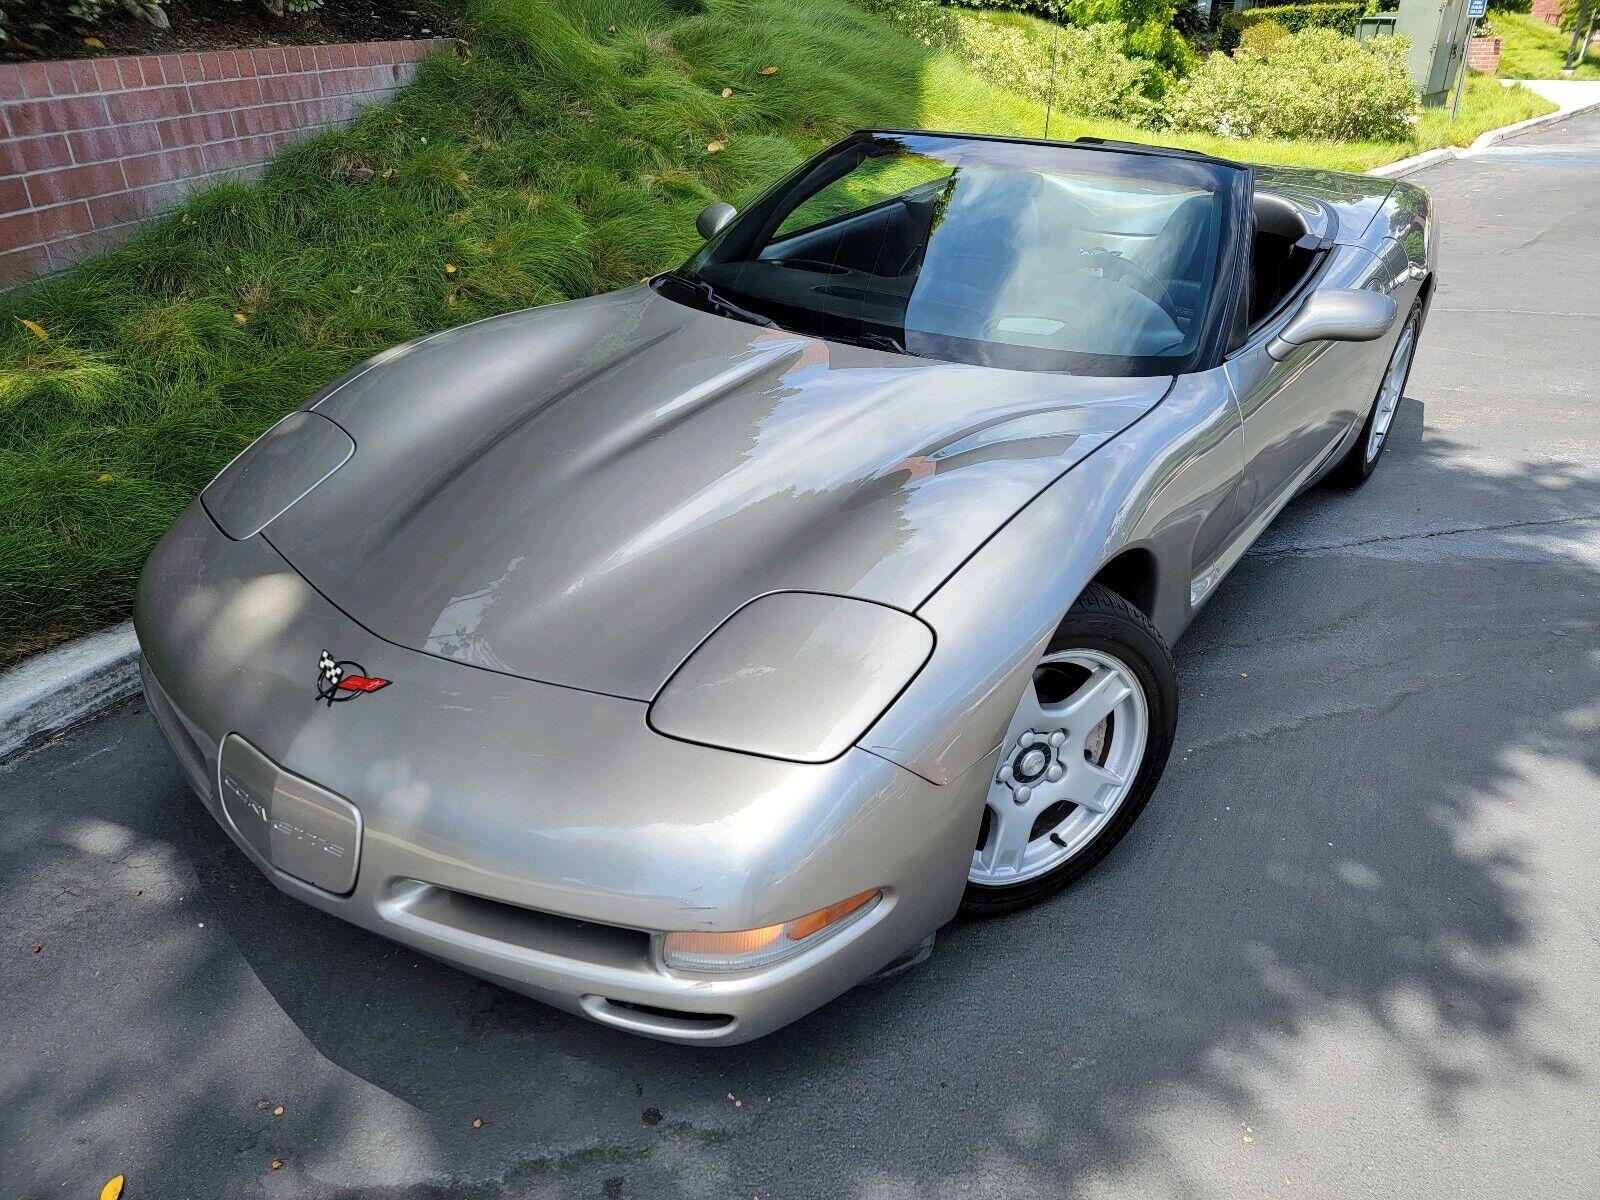 1999 Grey Chevrolet Corvette   | C5 Corvette Photo 1